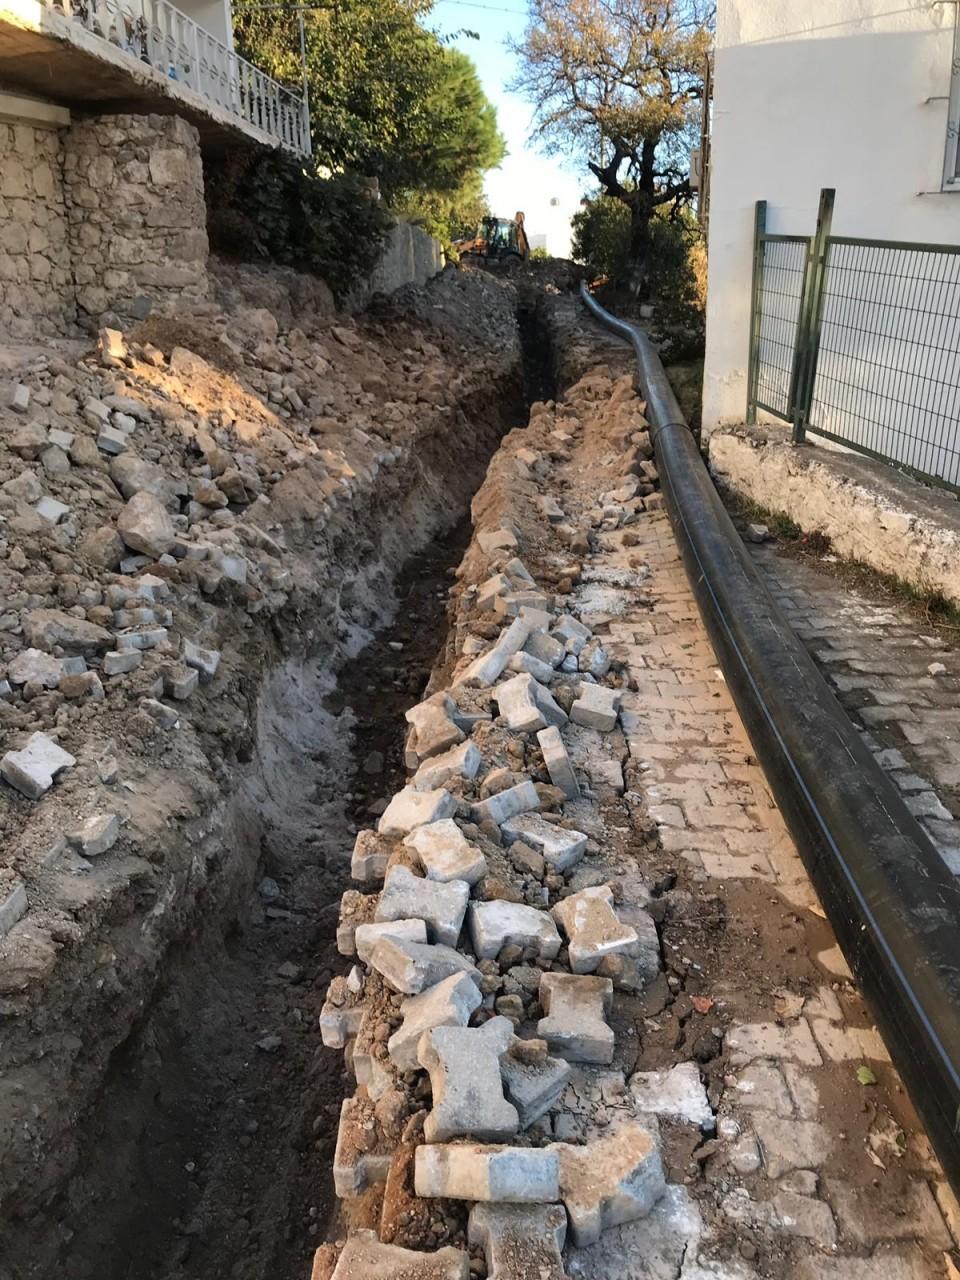 bodruma İÇme suyu hatti ORTAKENT YAHŞİ'YE YENİ İÇME SUYU HATTI… 6303335428 1